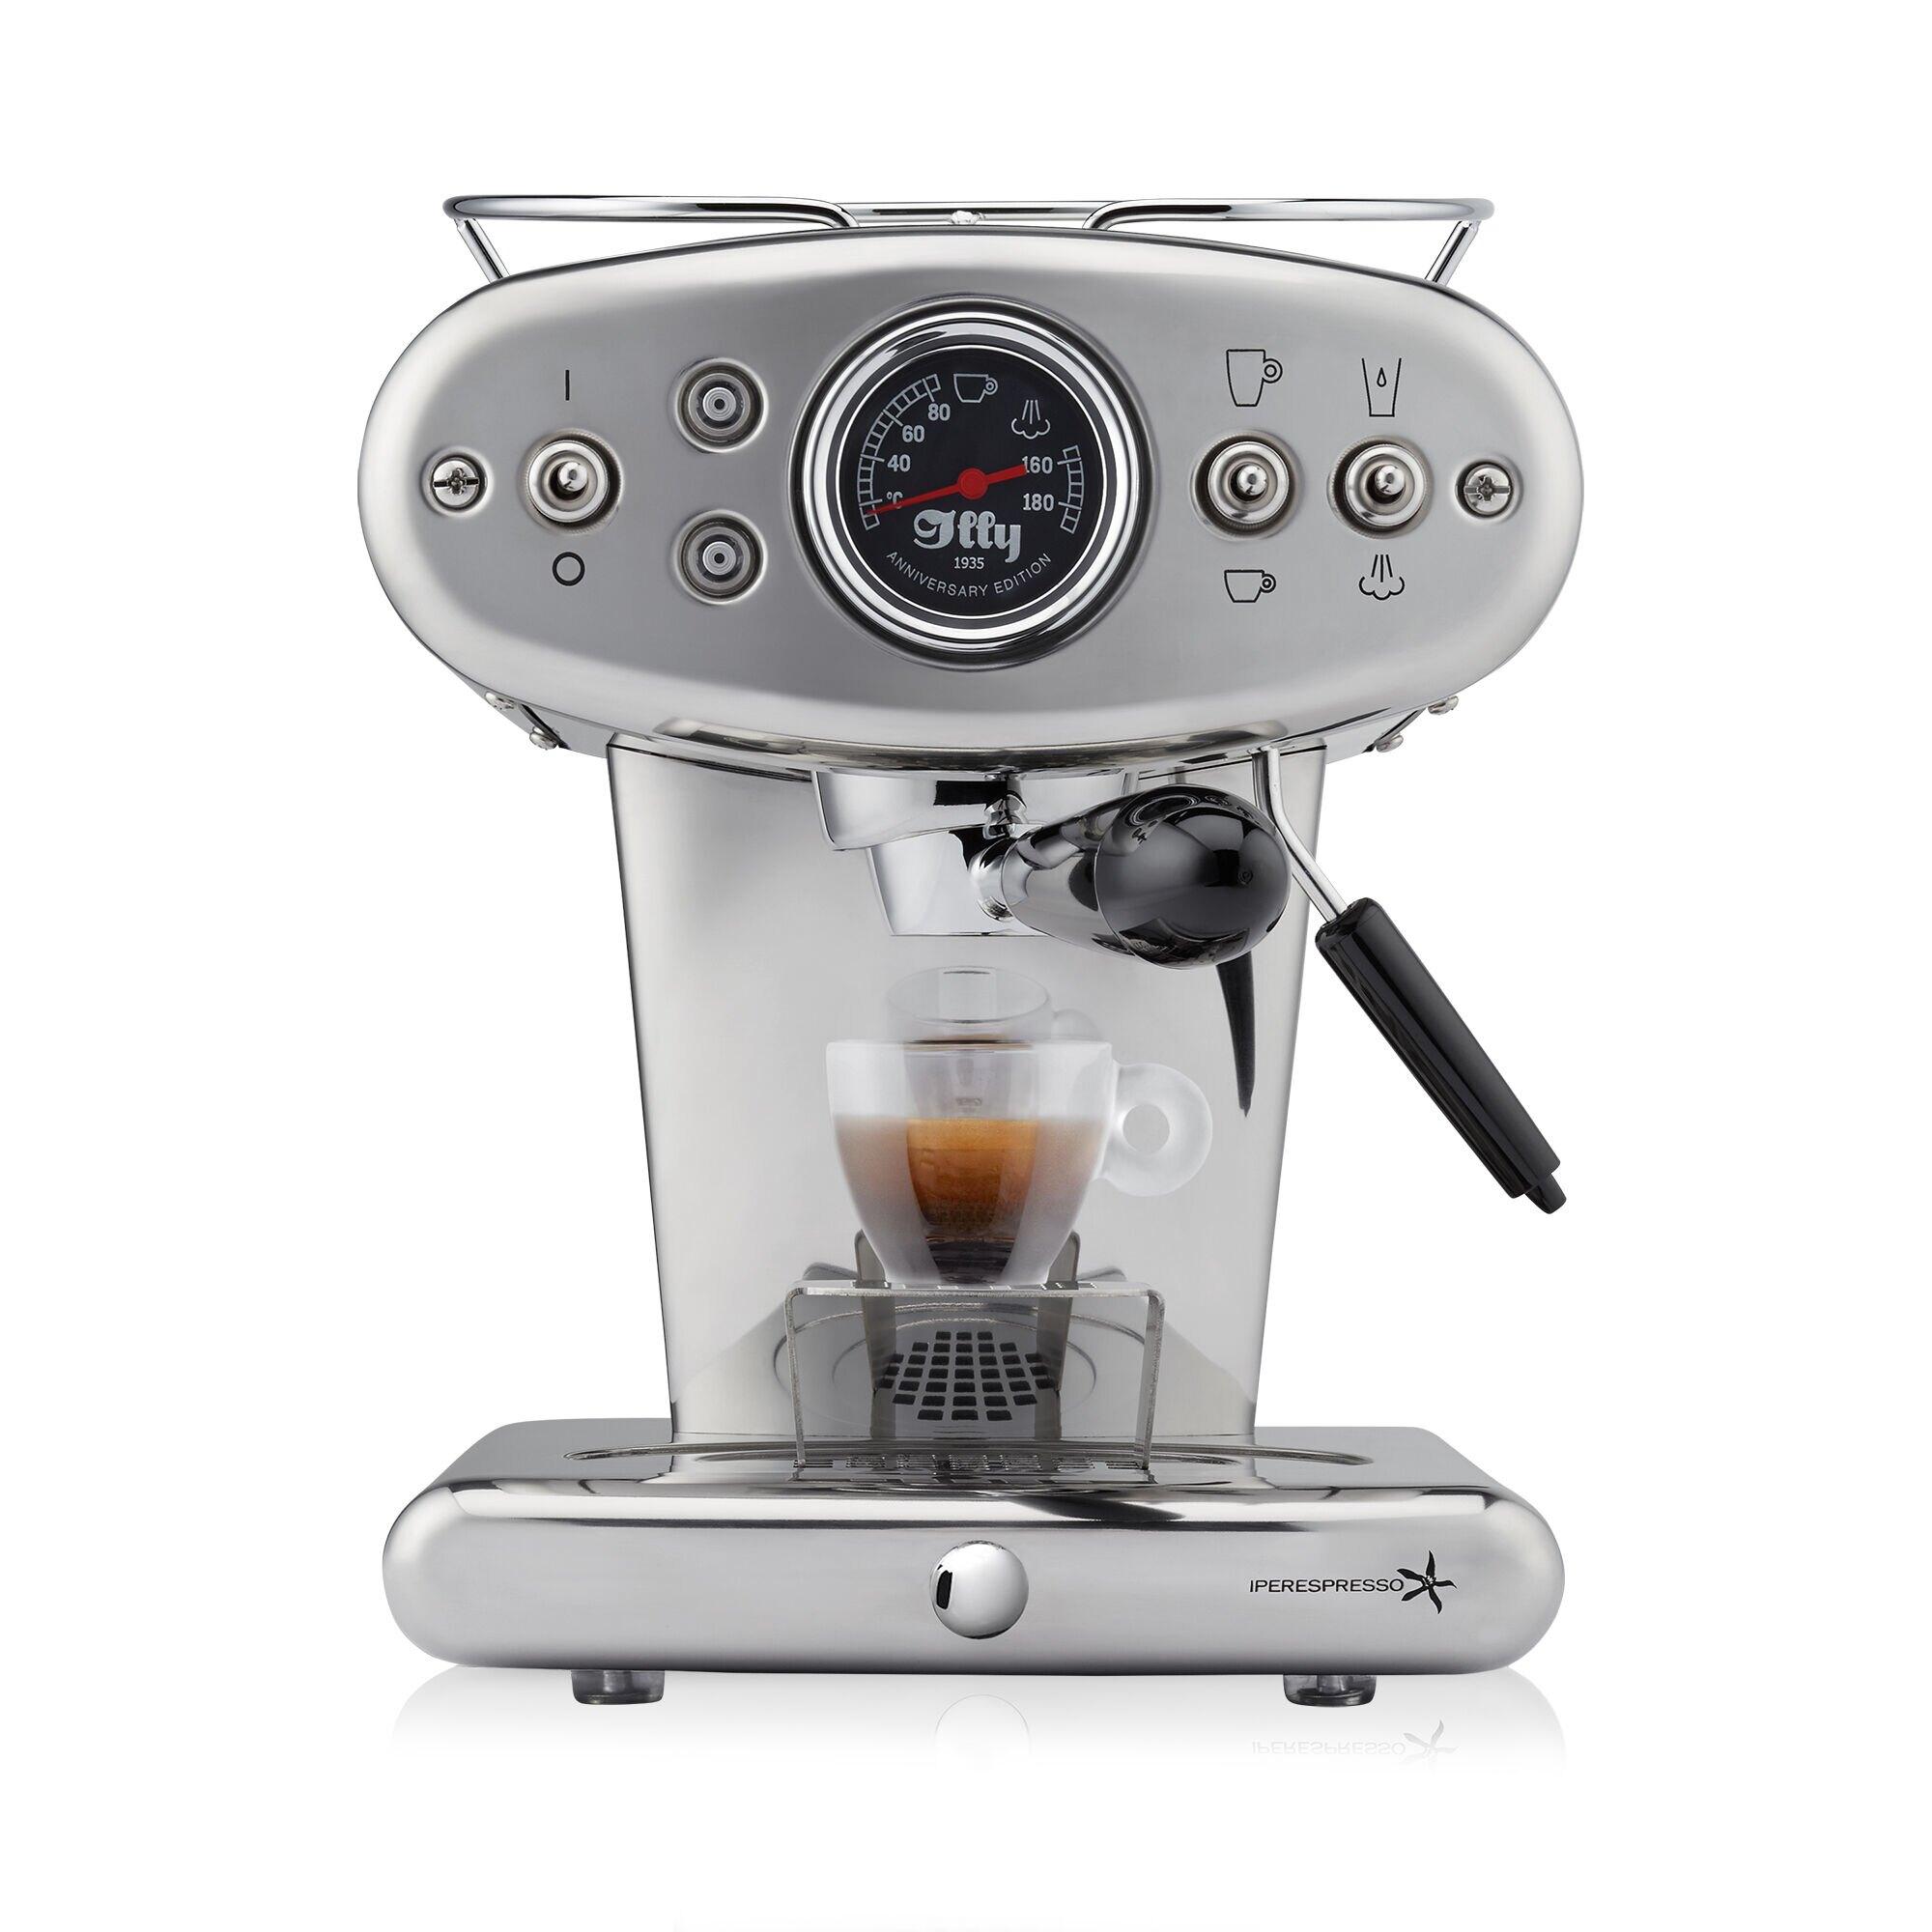 Capsule Coffee Machine X1 Iperespresso Anniversary 1935